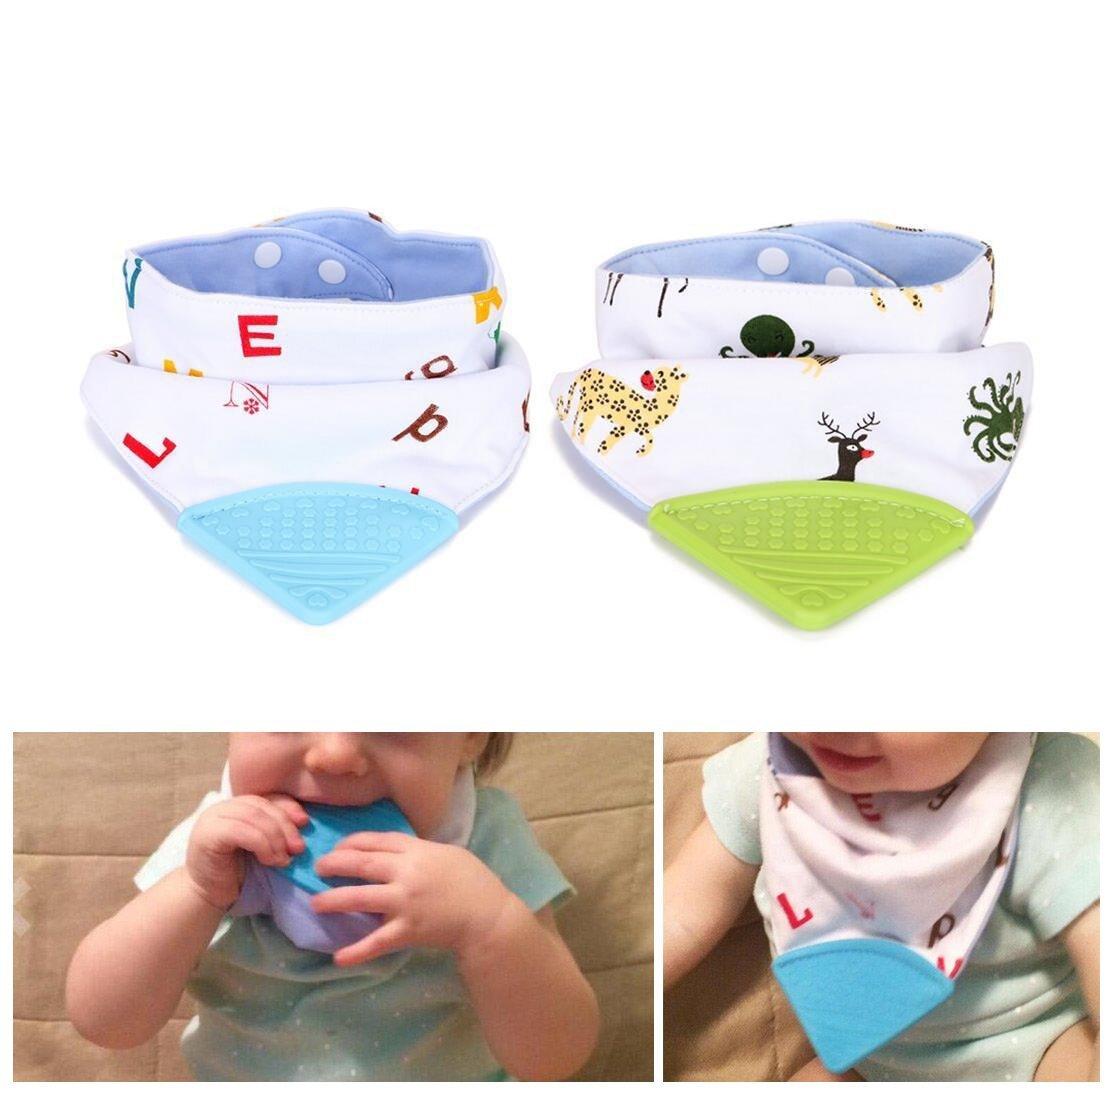 Cheap Knit Baby Bib Patterns Free, find Knit Baby Bib Patterns Free ...